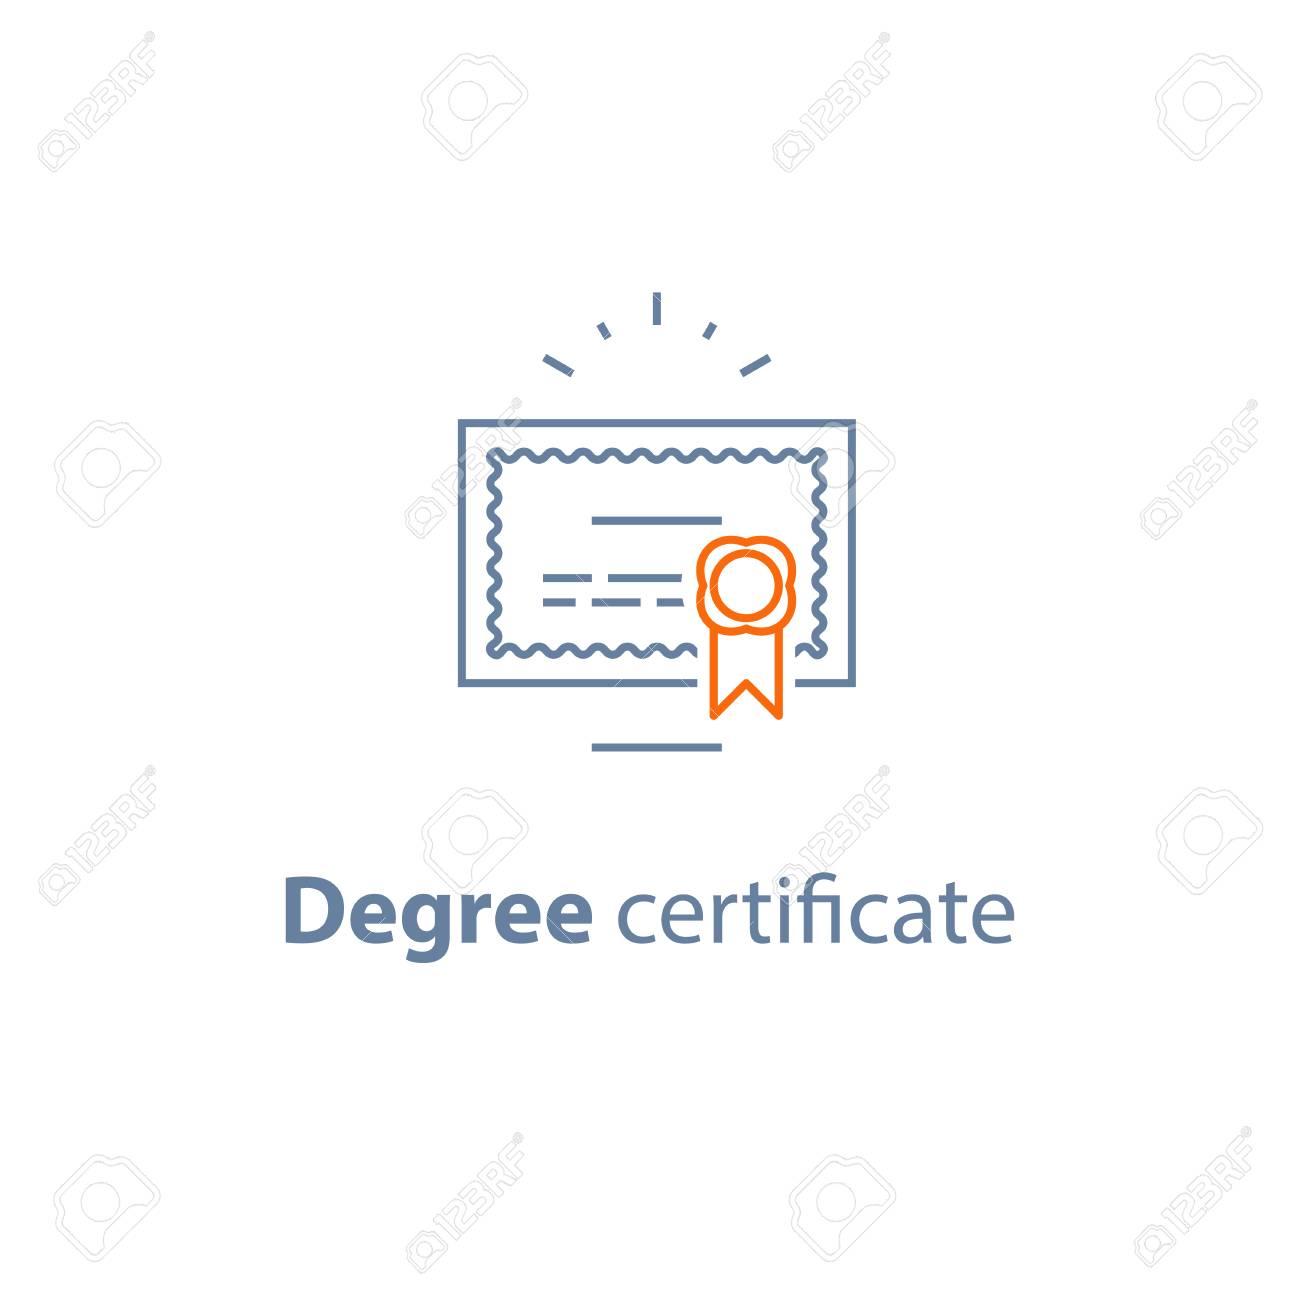 Graduation Certificate | Graduation Diploma Degree Certificate Education Concept Vector